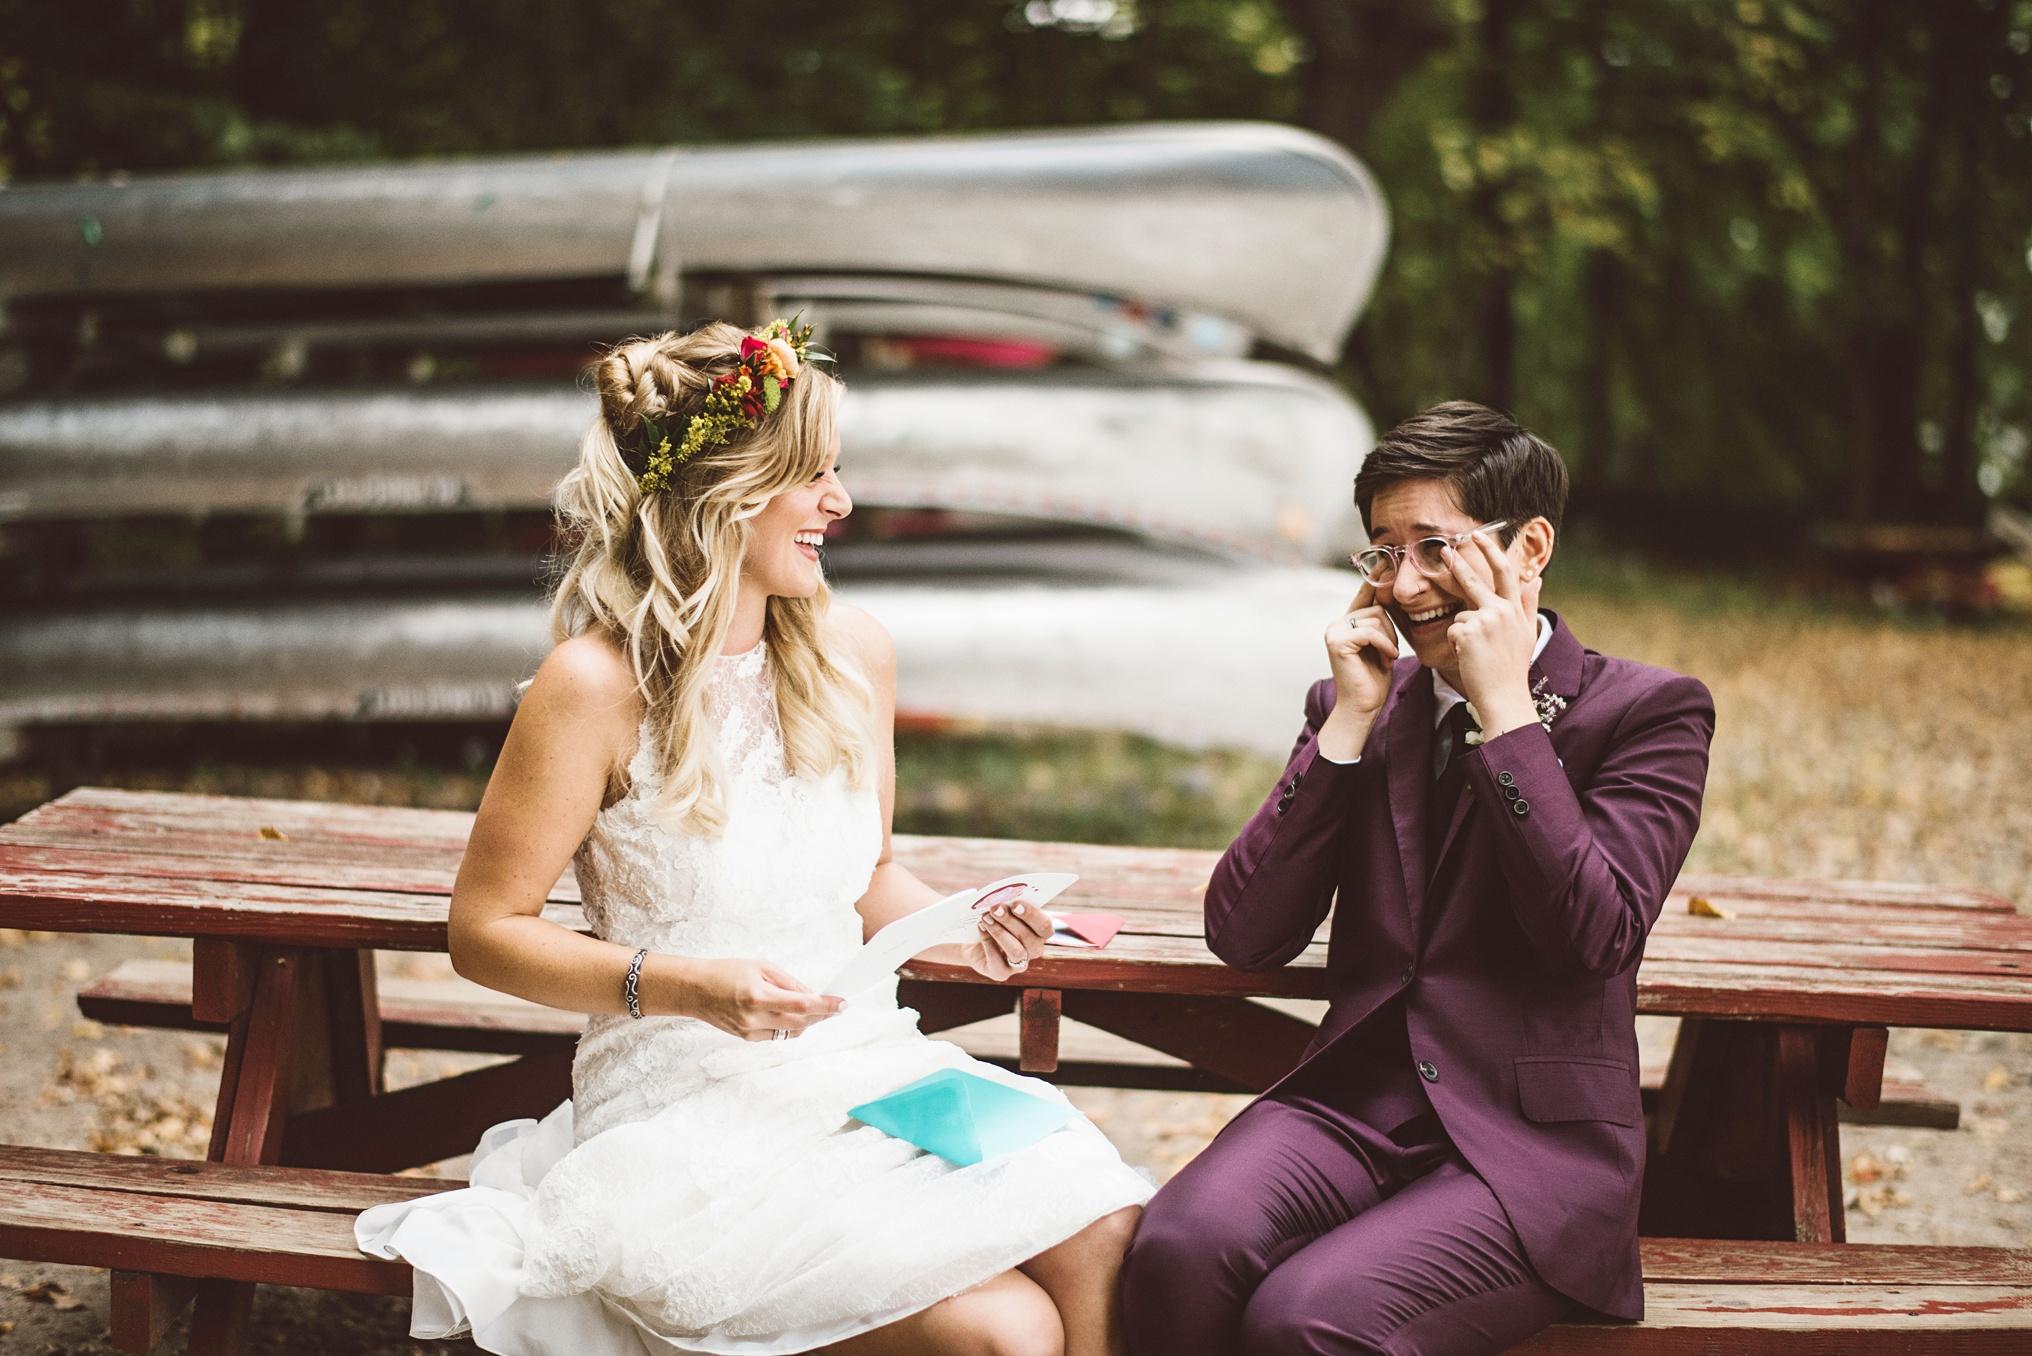 best_wedding_photography_2017_by_lucas_botz_photography_112.jpg